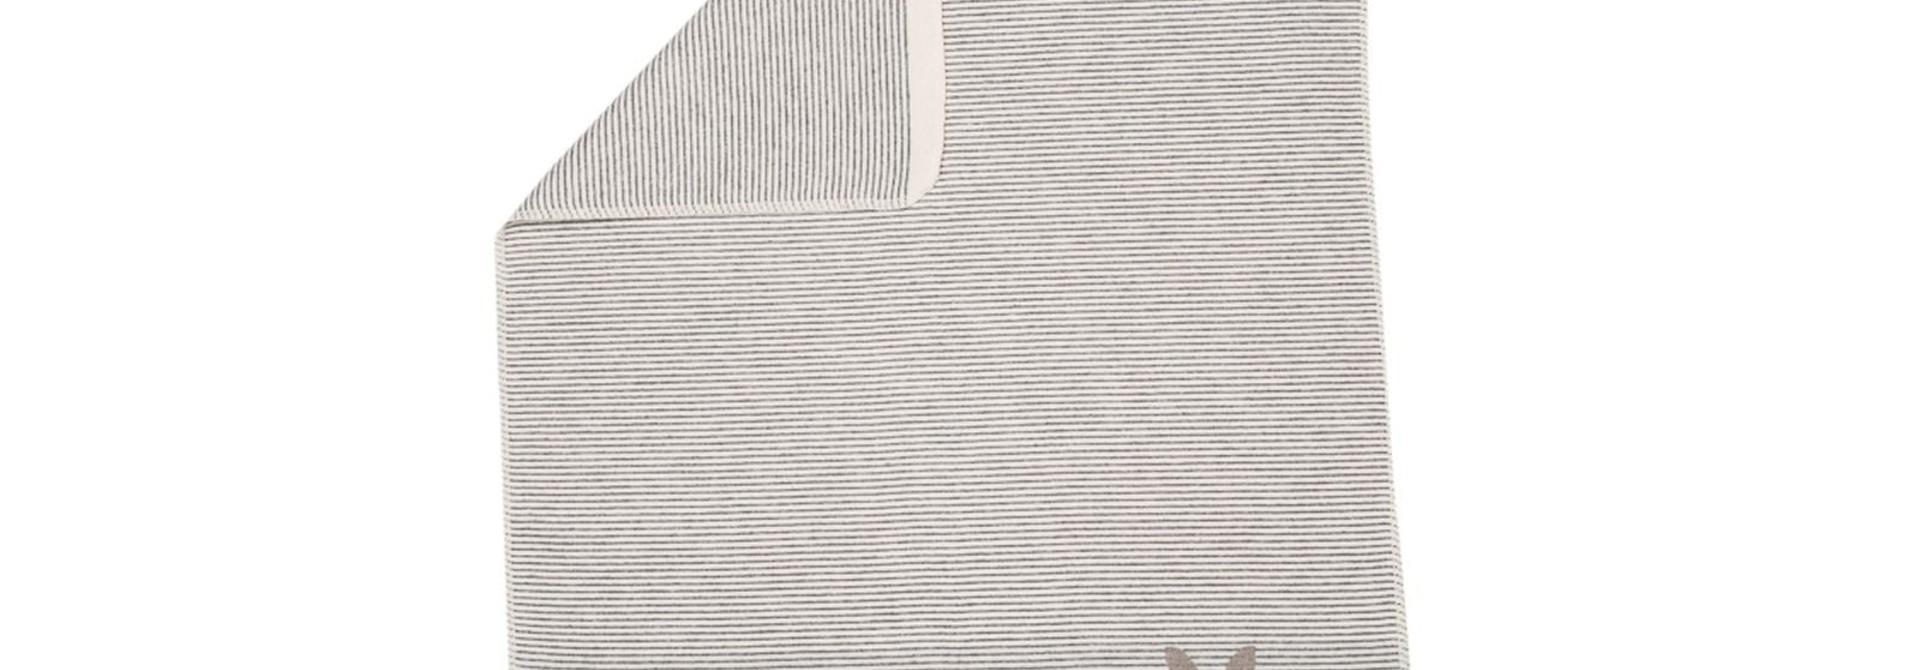 Blanket -  Bunny - Stripe Grey